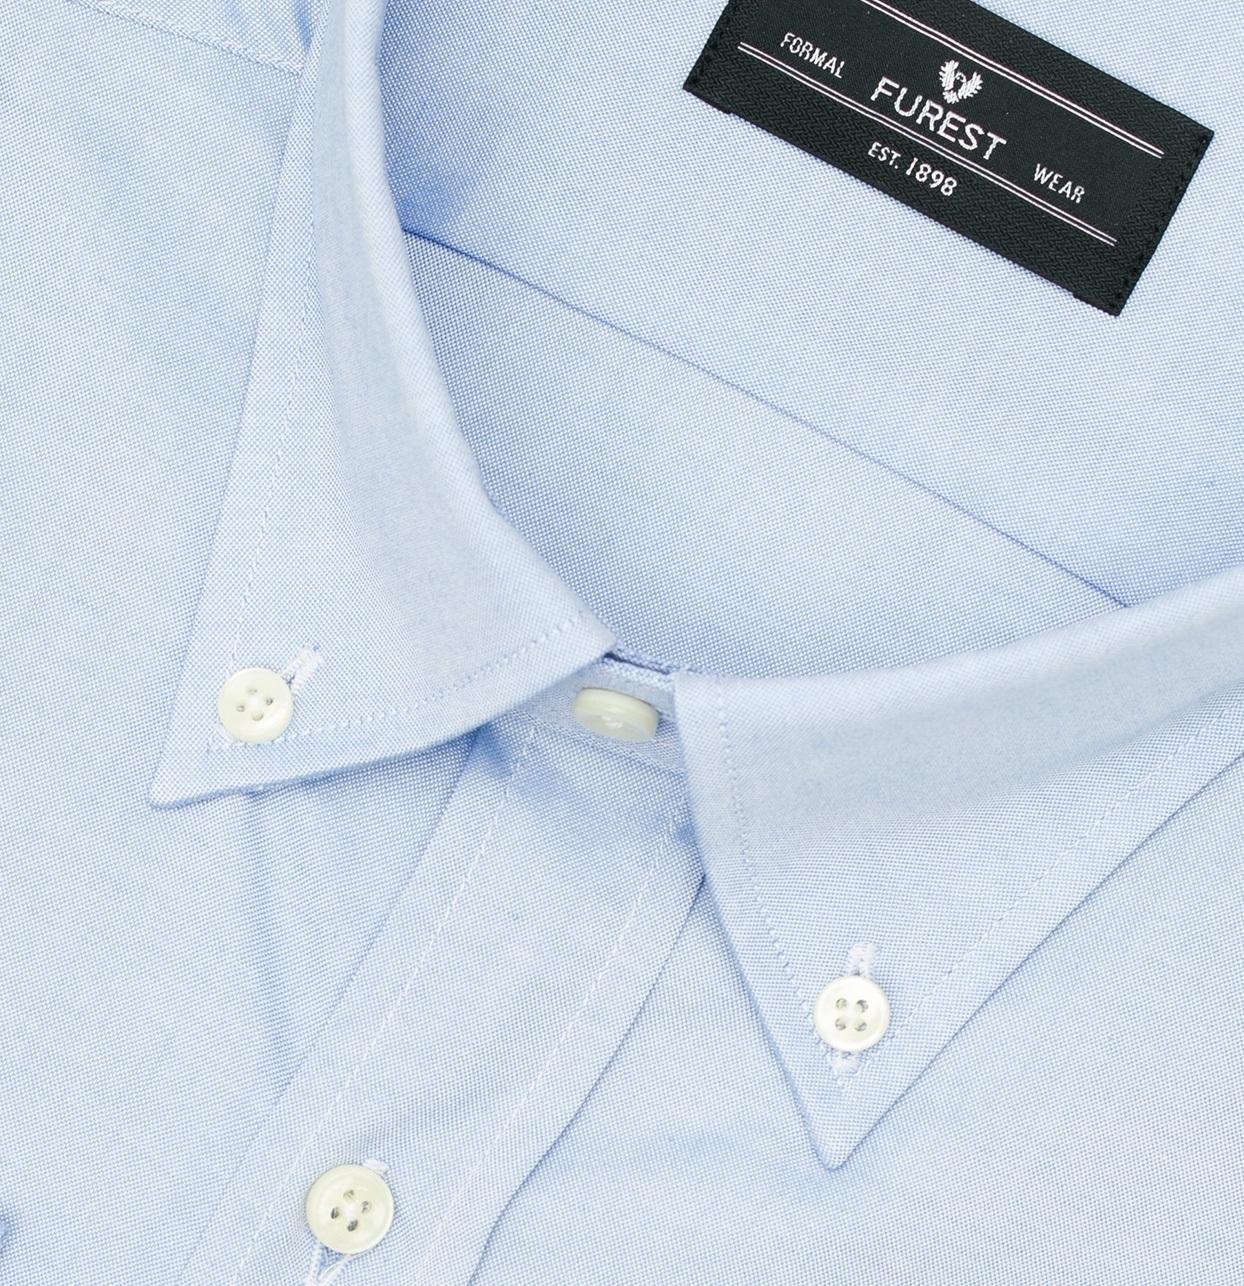 Camisa Formal Wear REGULAR FIT Modelo BOTTON DOWN Tejido Pin point color azul, 100% Algodón - Ítem1